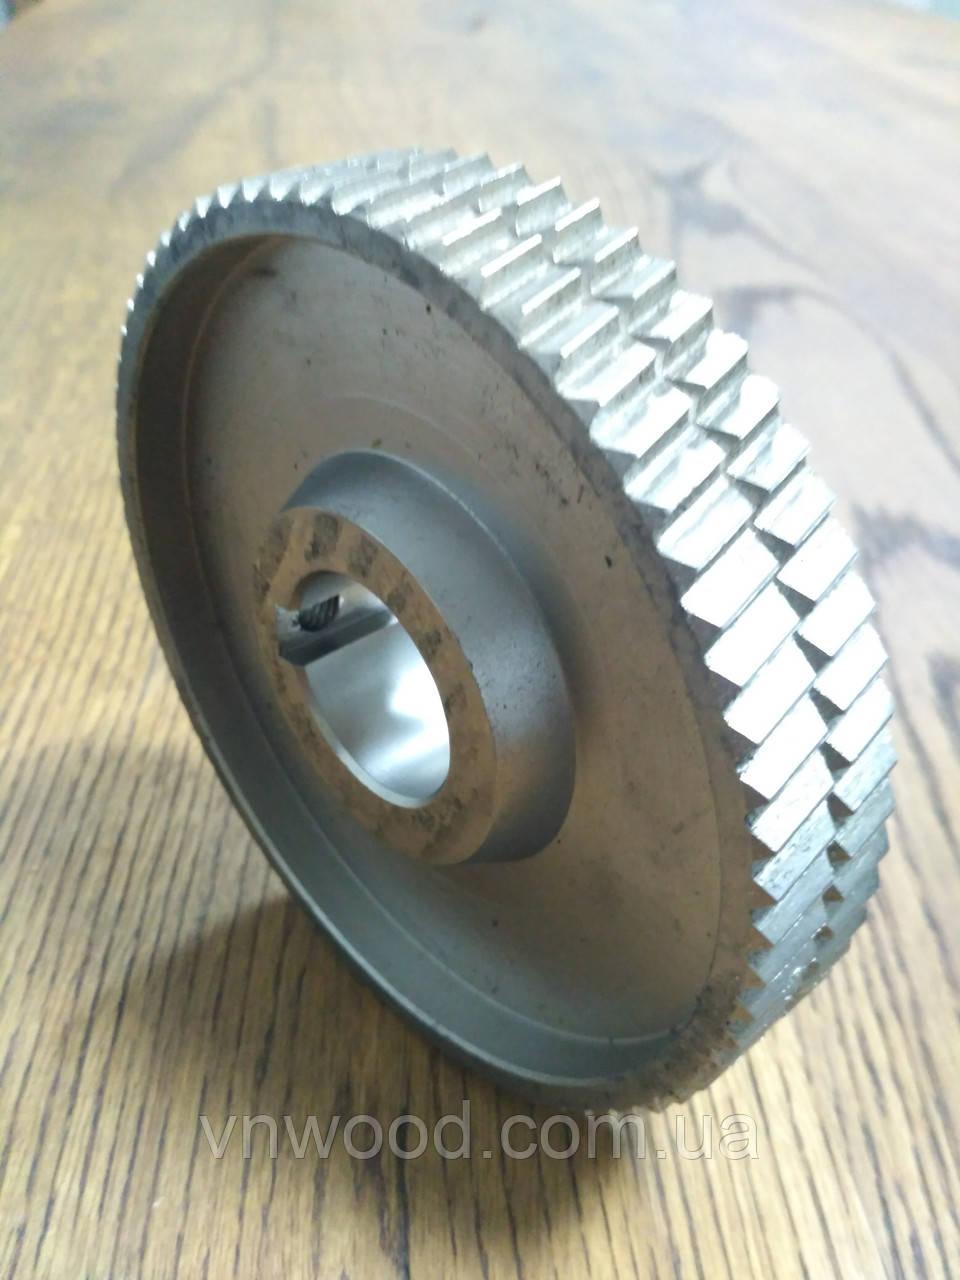 Подаючий ролик чотирьохстороннього станка Φ140XΦ35x25 (метал)